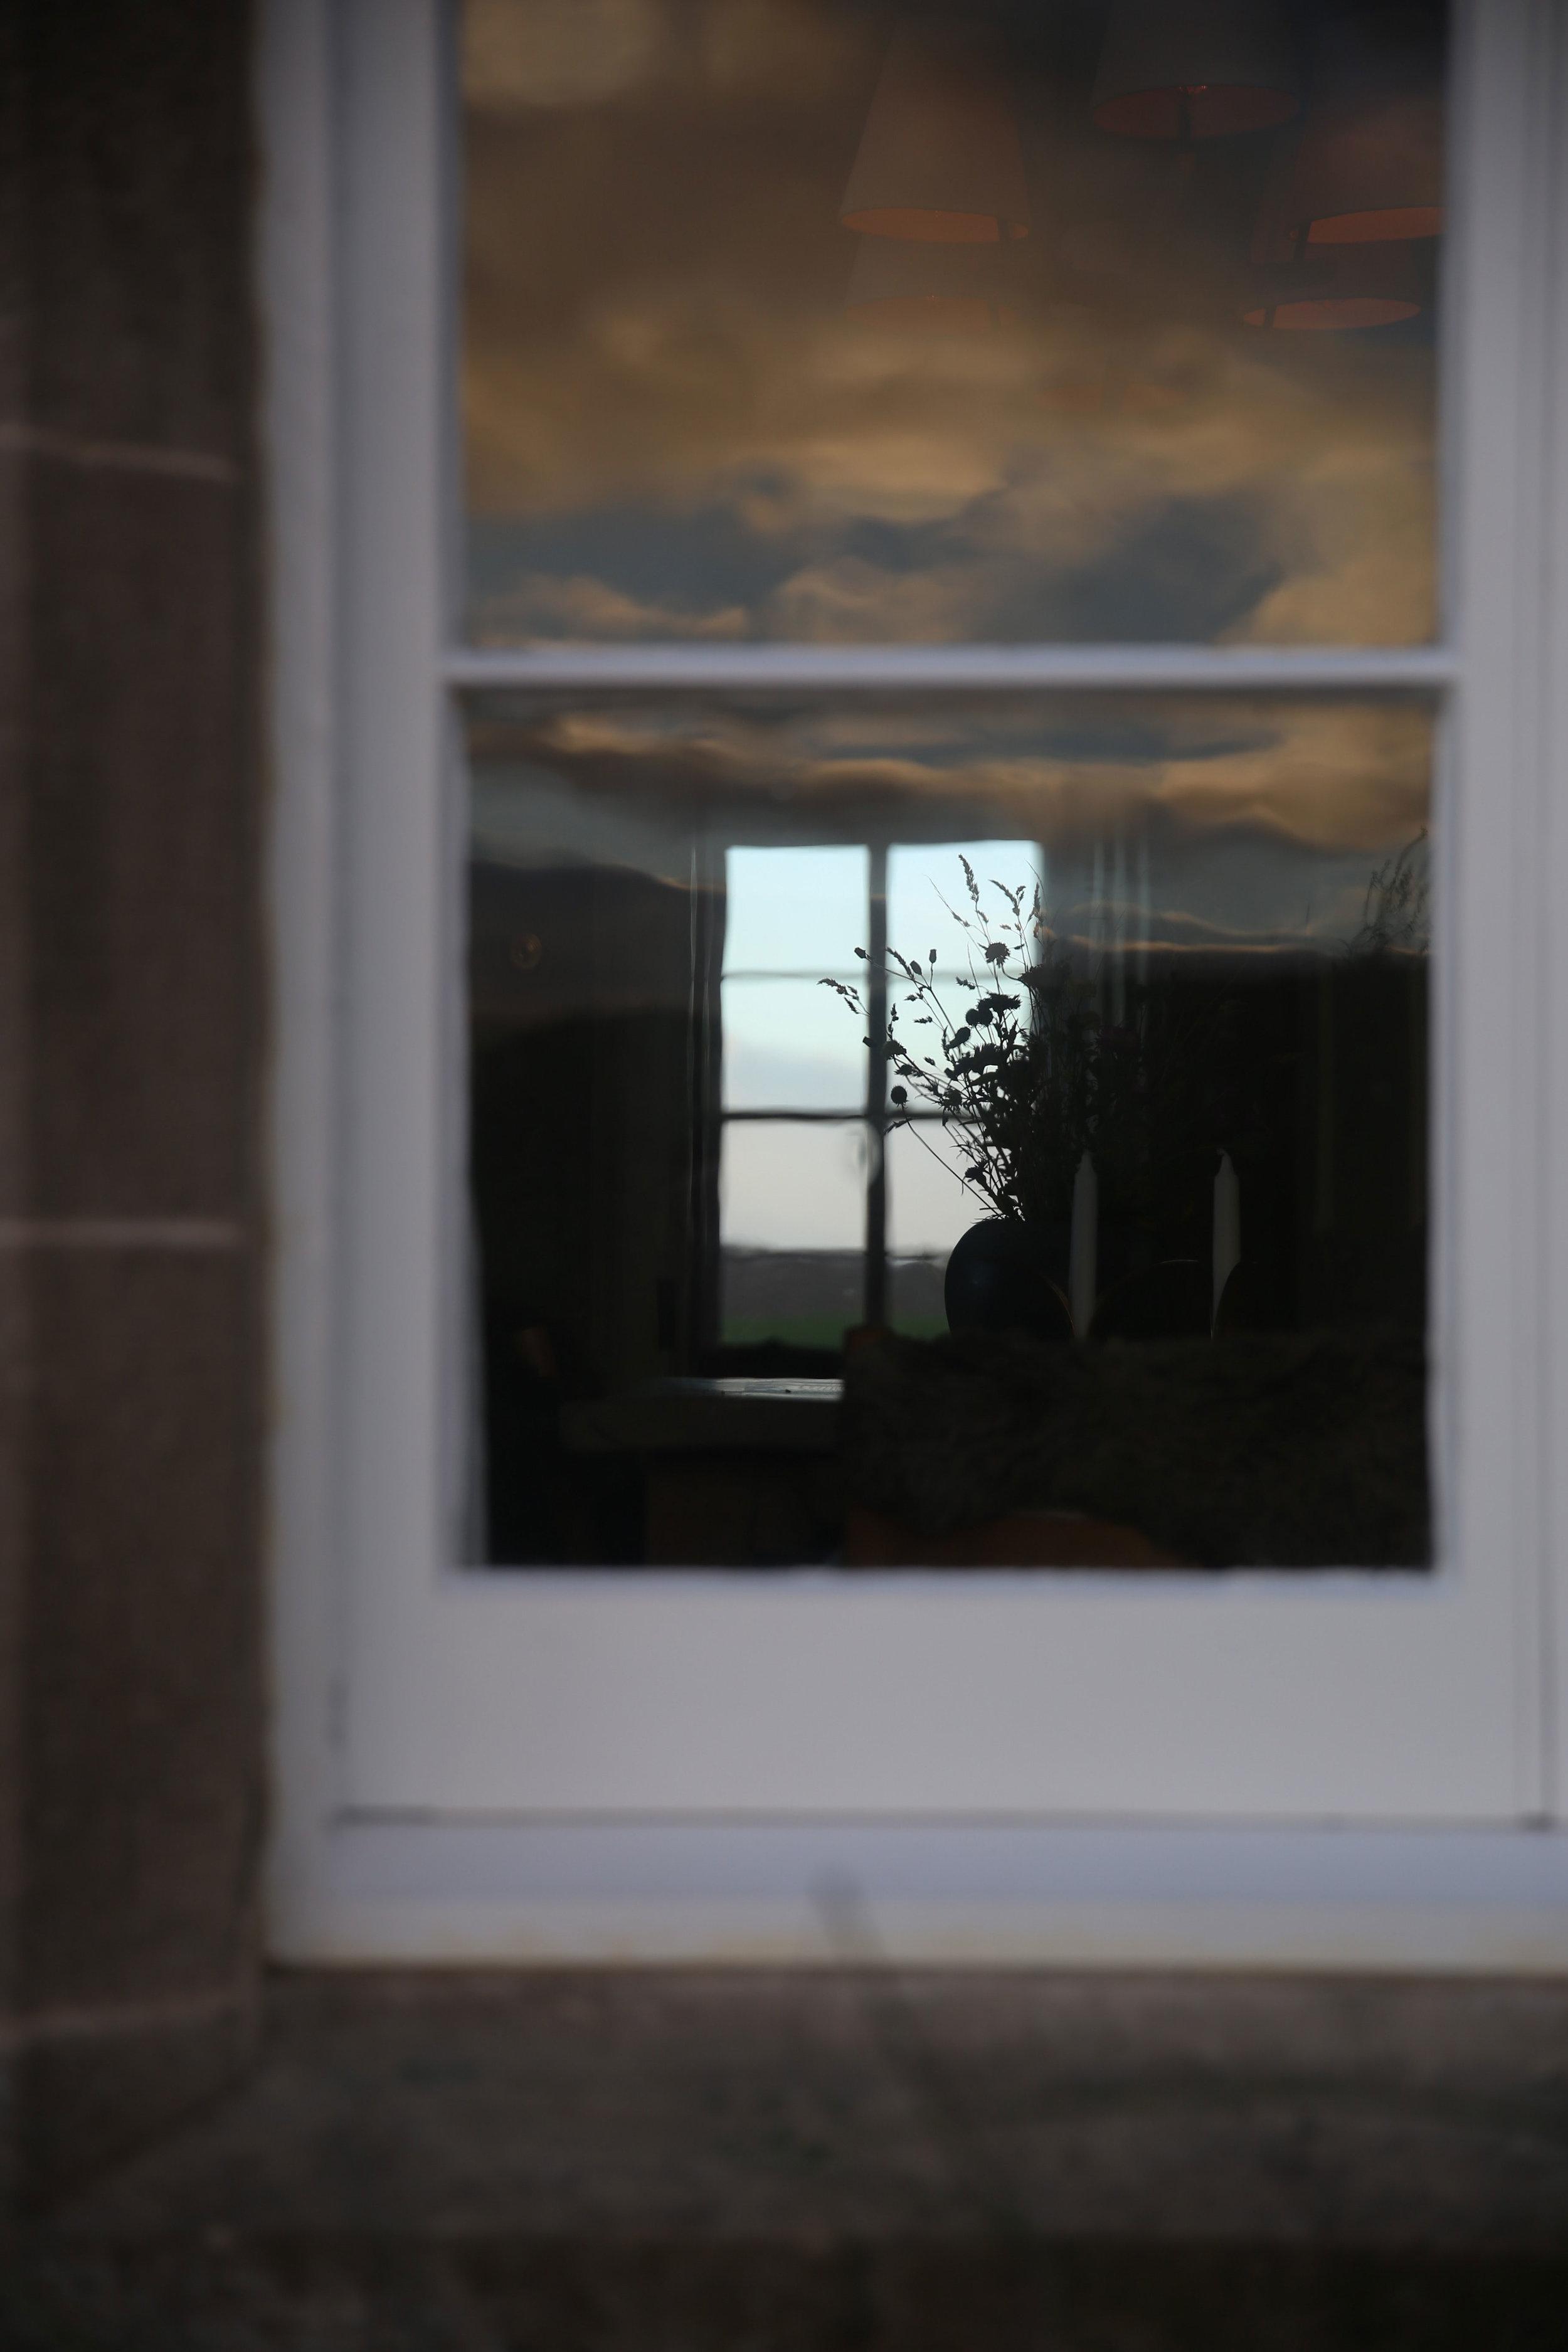 cloud-reflection.jpg